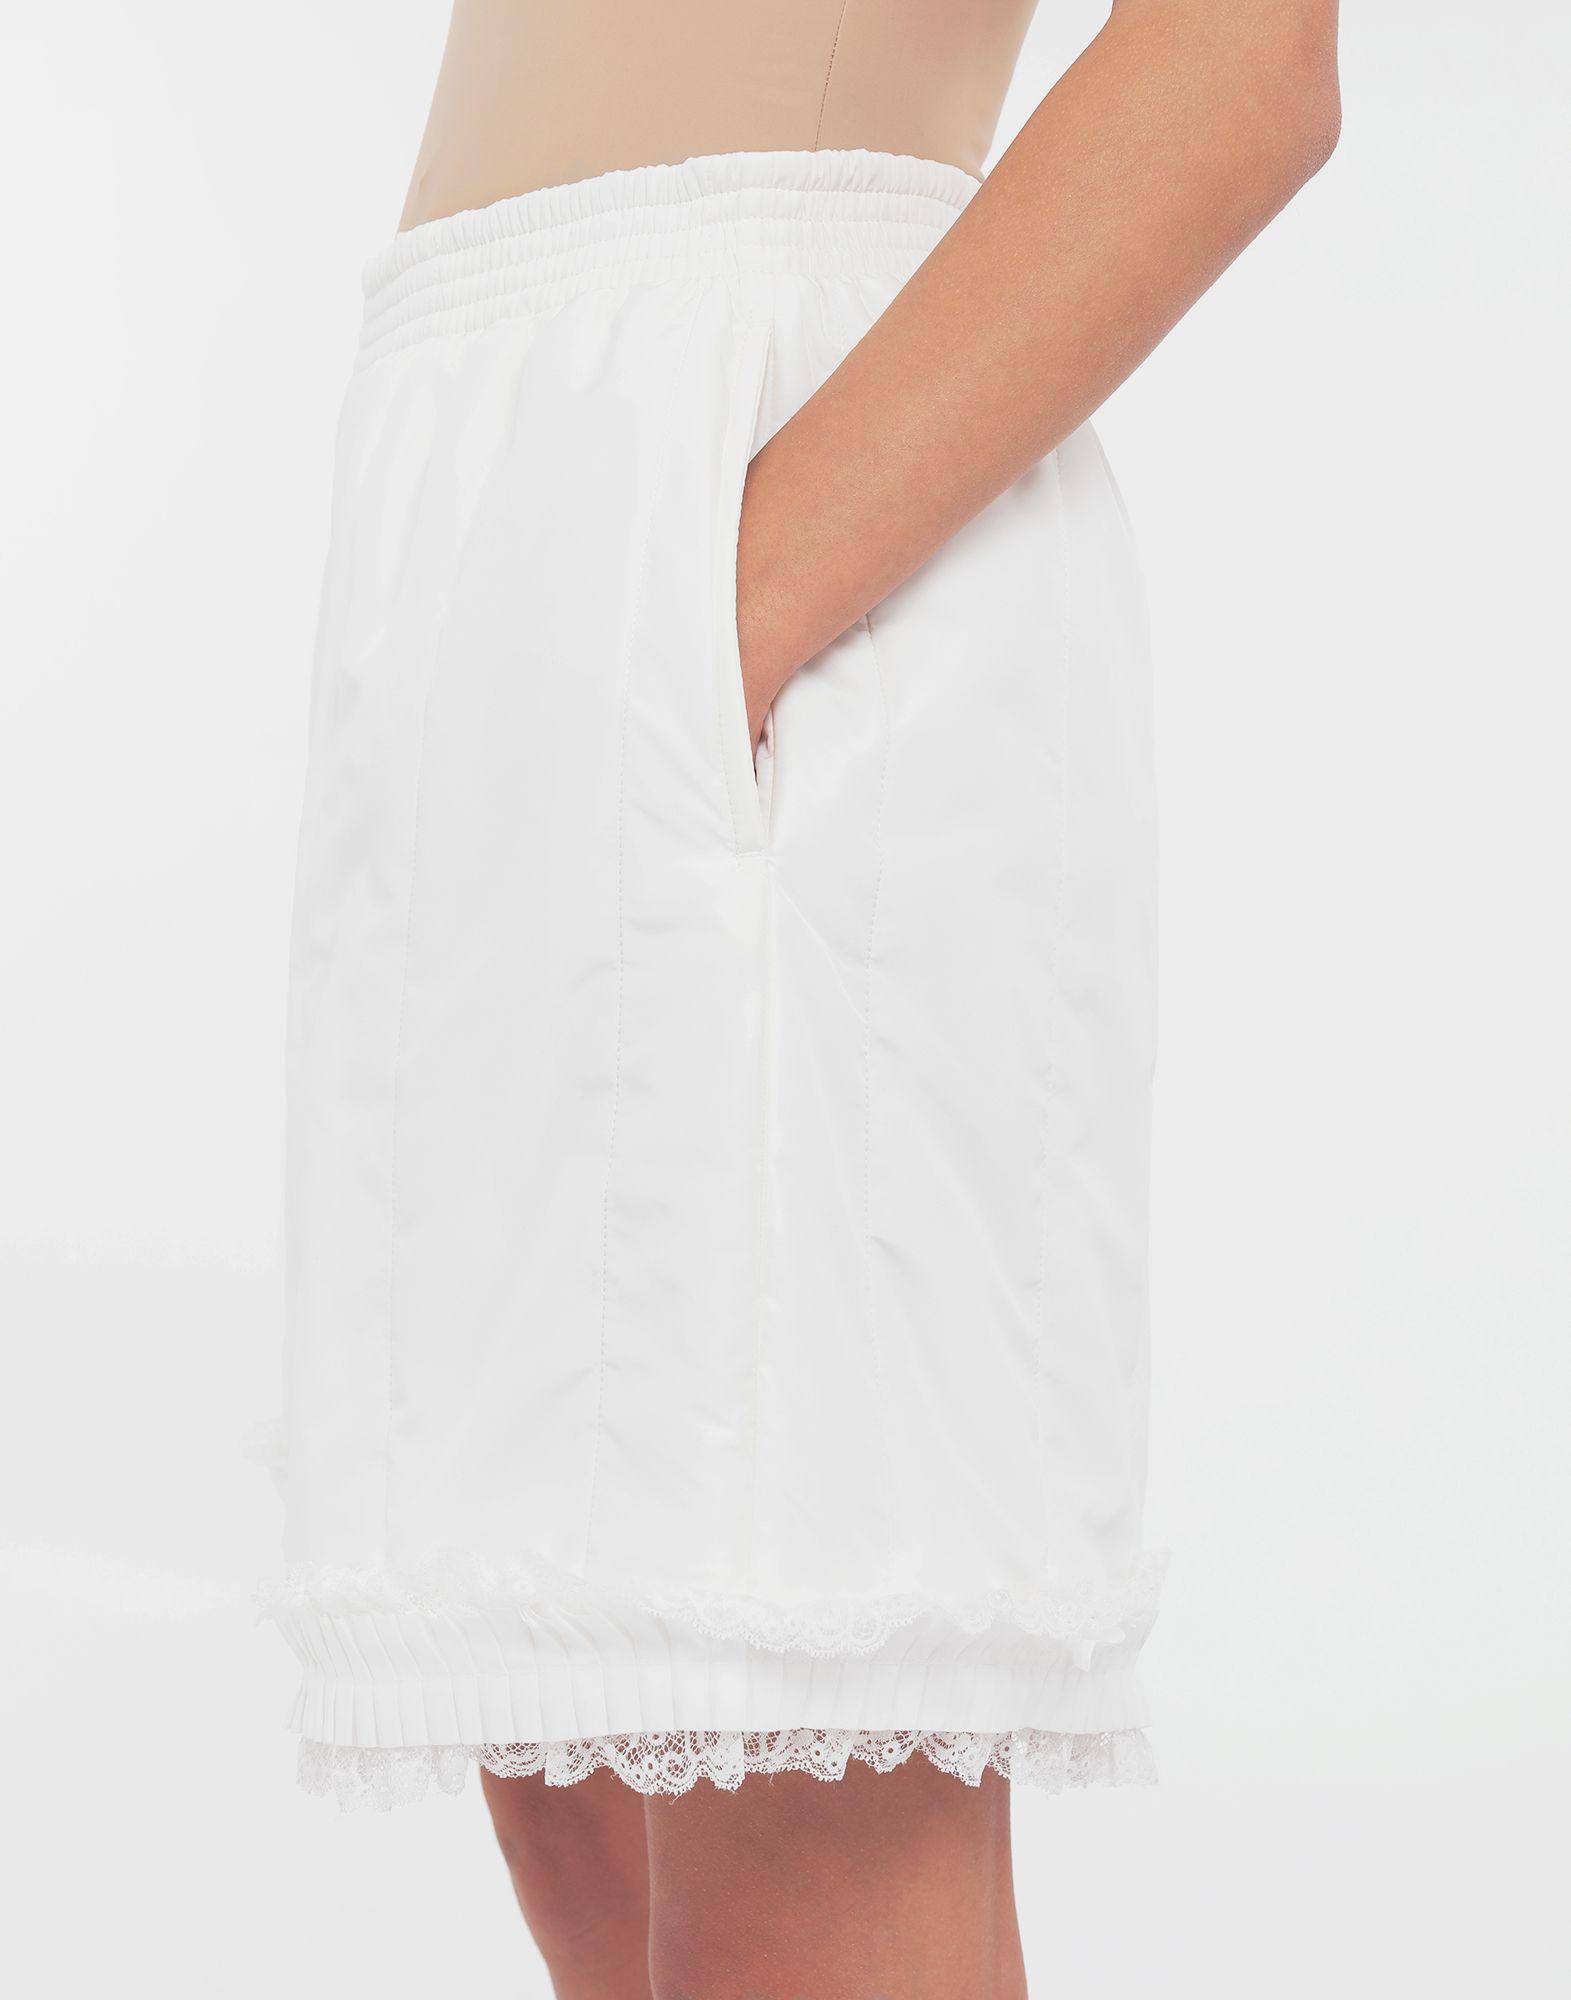 MM6 MAISON MARGIELA Lace-trimmed jersey shorts Shorts Woman a